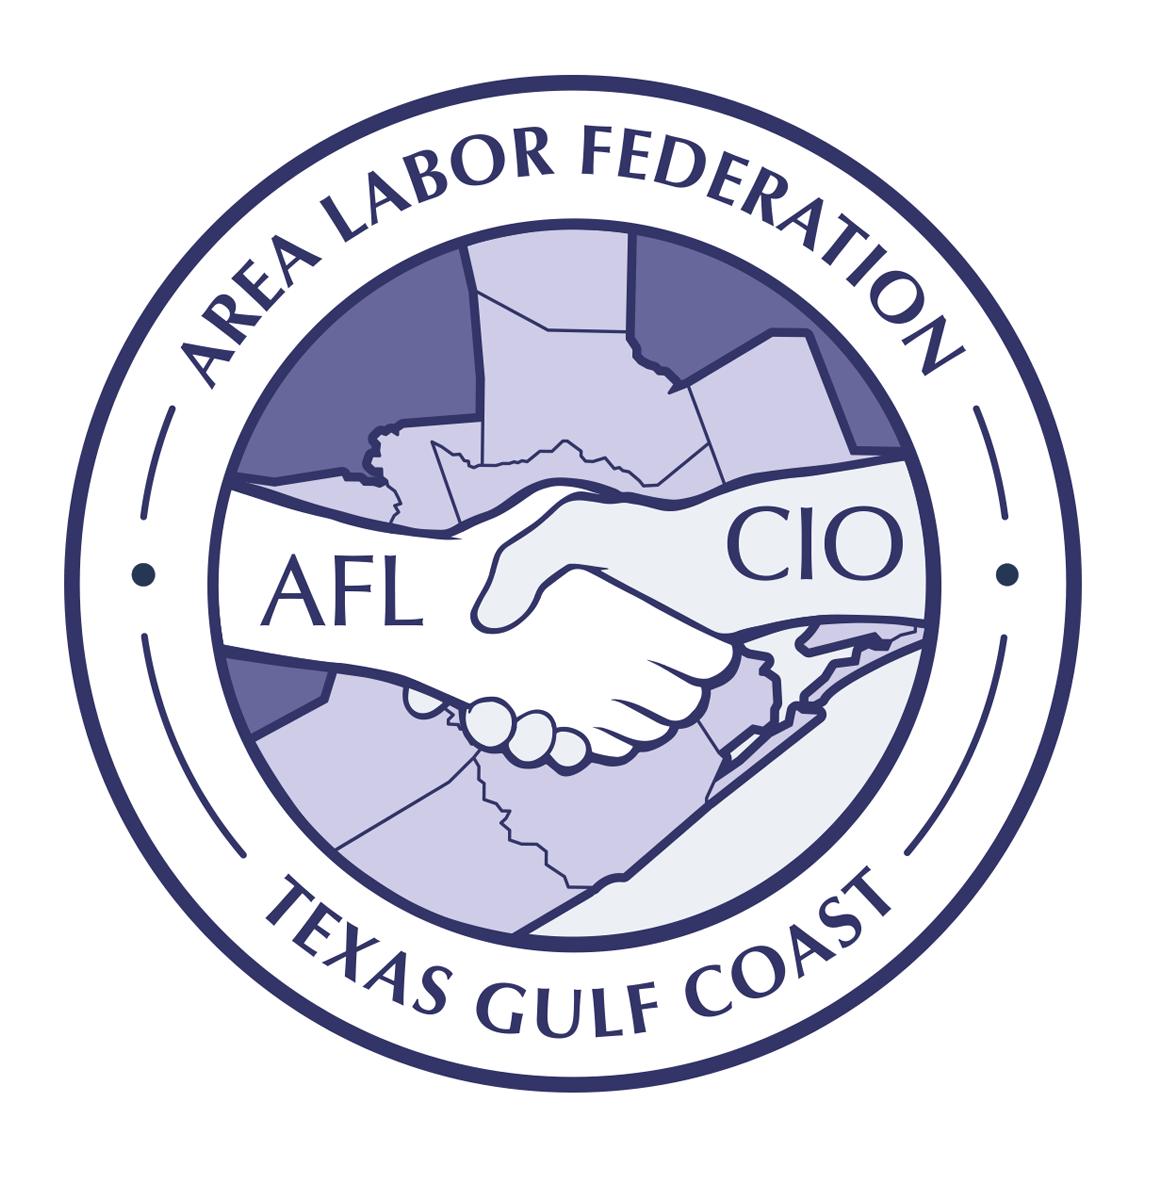 Texas Gulf Coast Area Labor Federation